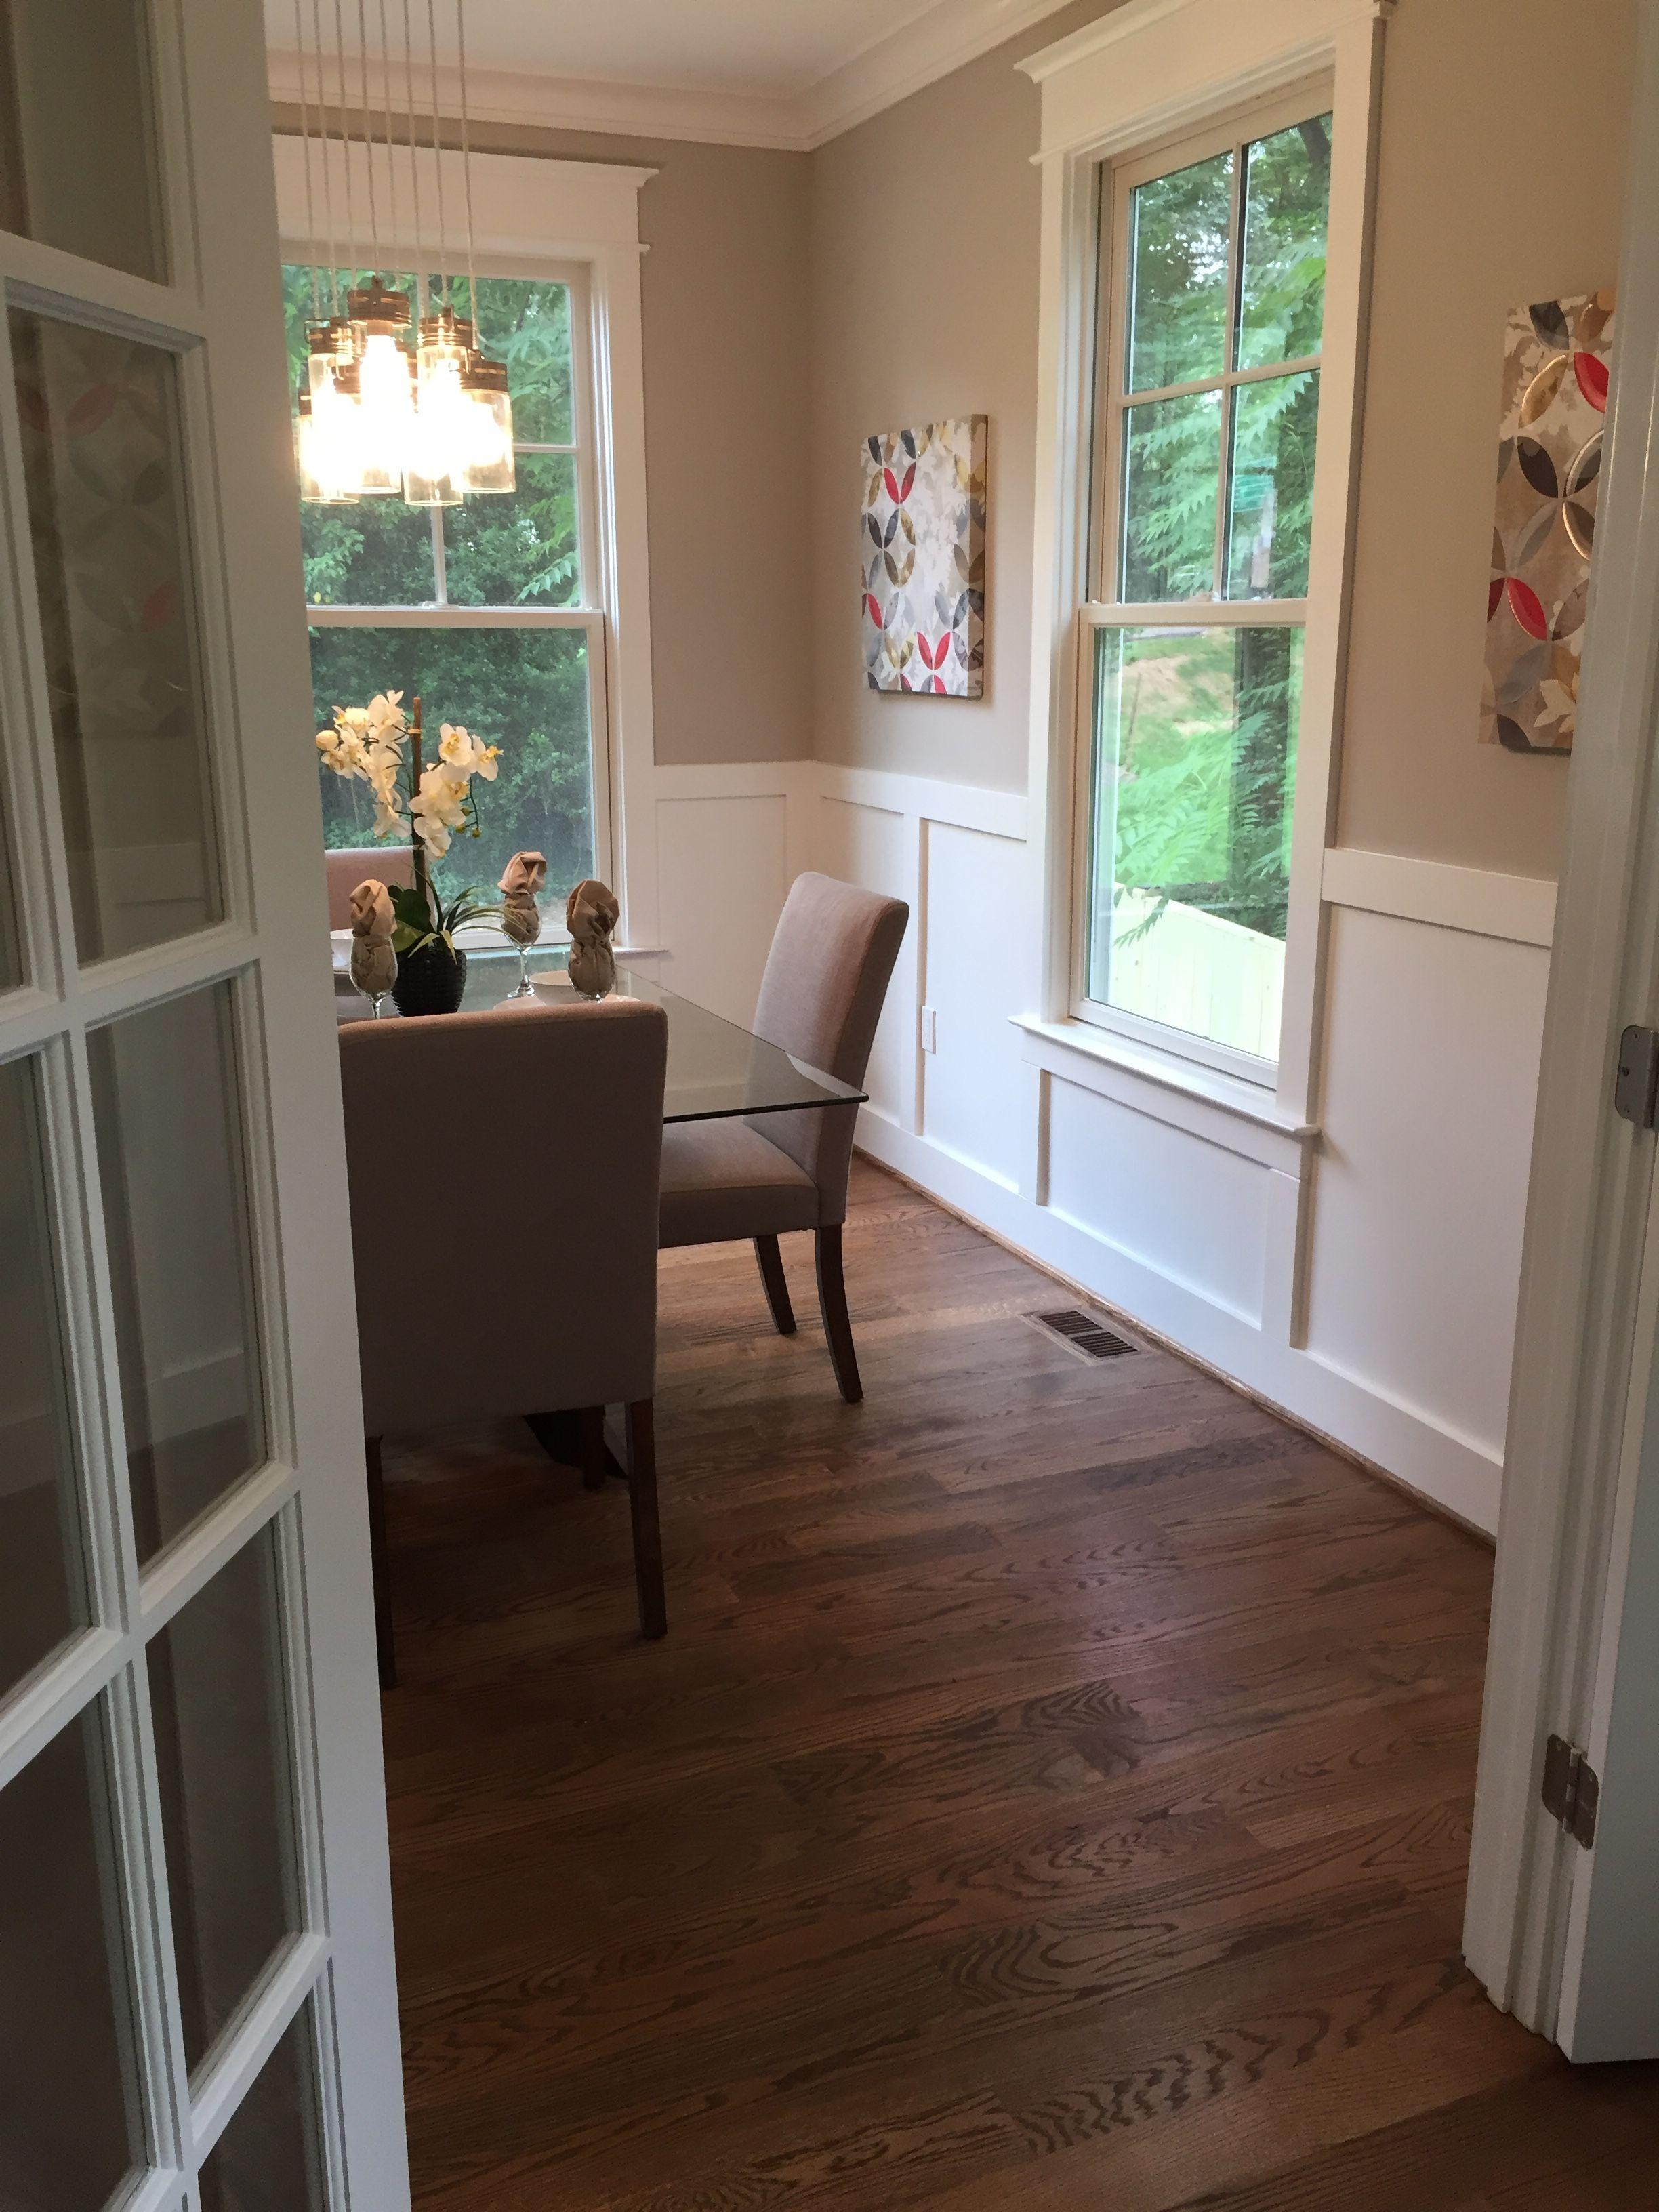 Pin by Elizabeth Horak on Arlington open houses   House ...